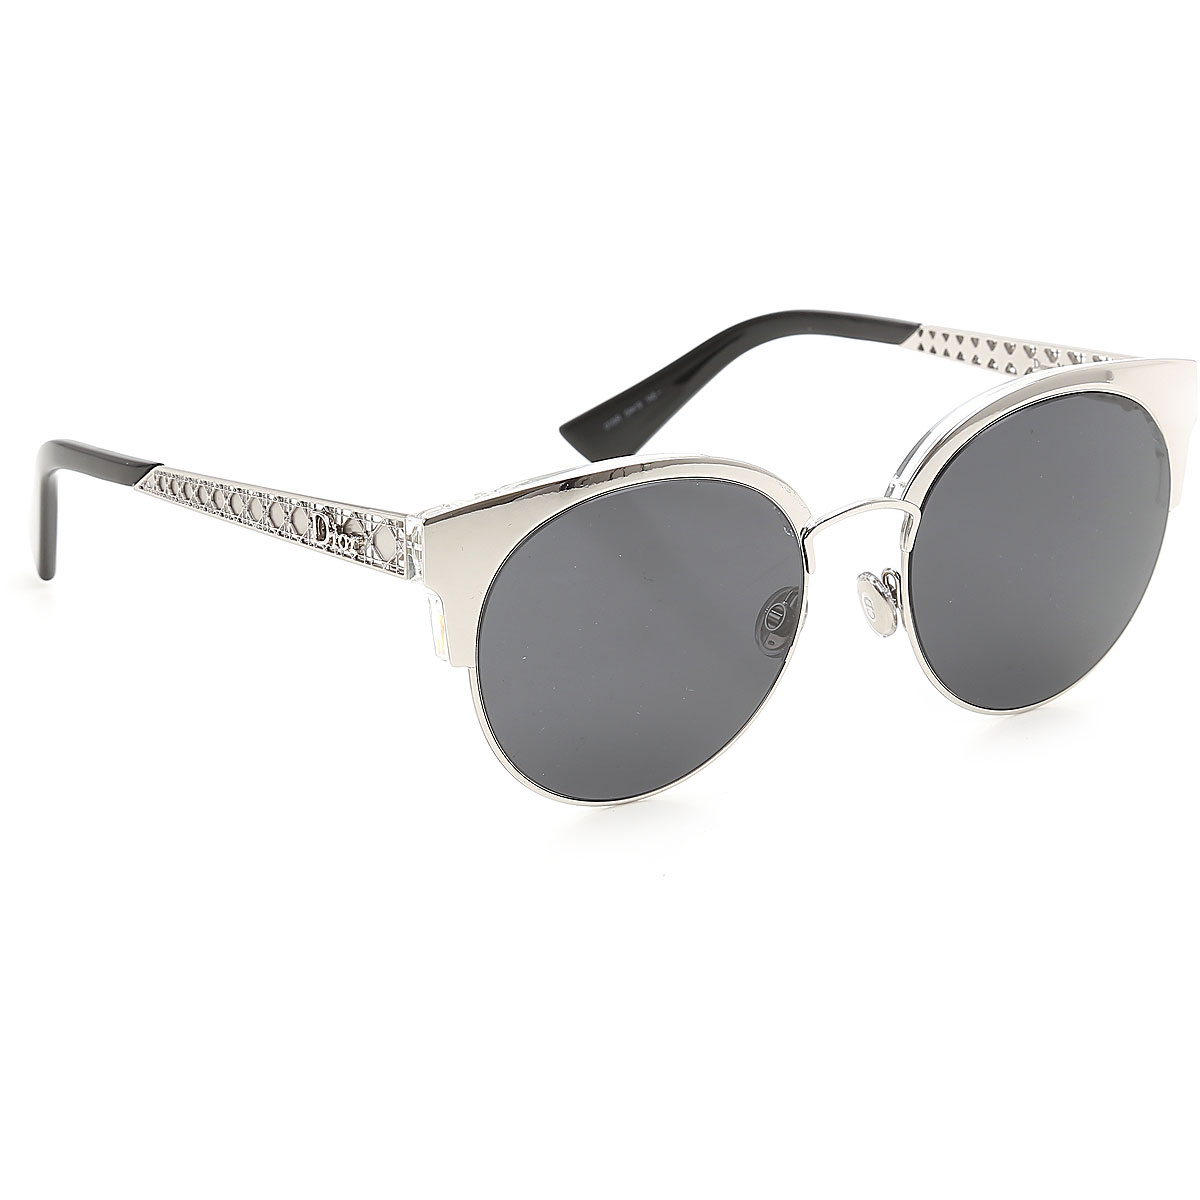 Sunglasses Christian Dior 8414d51976d